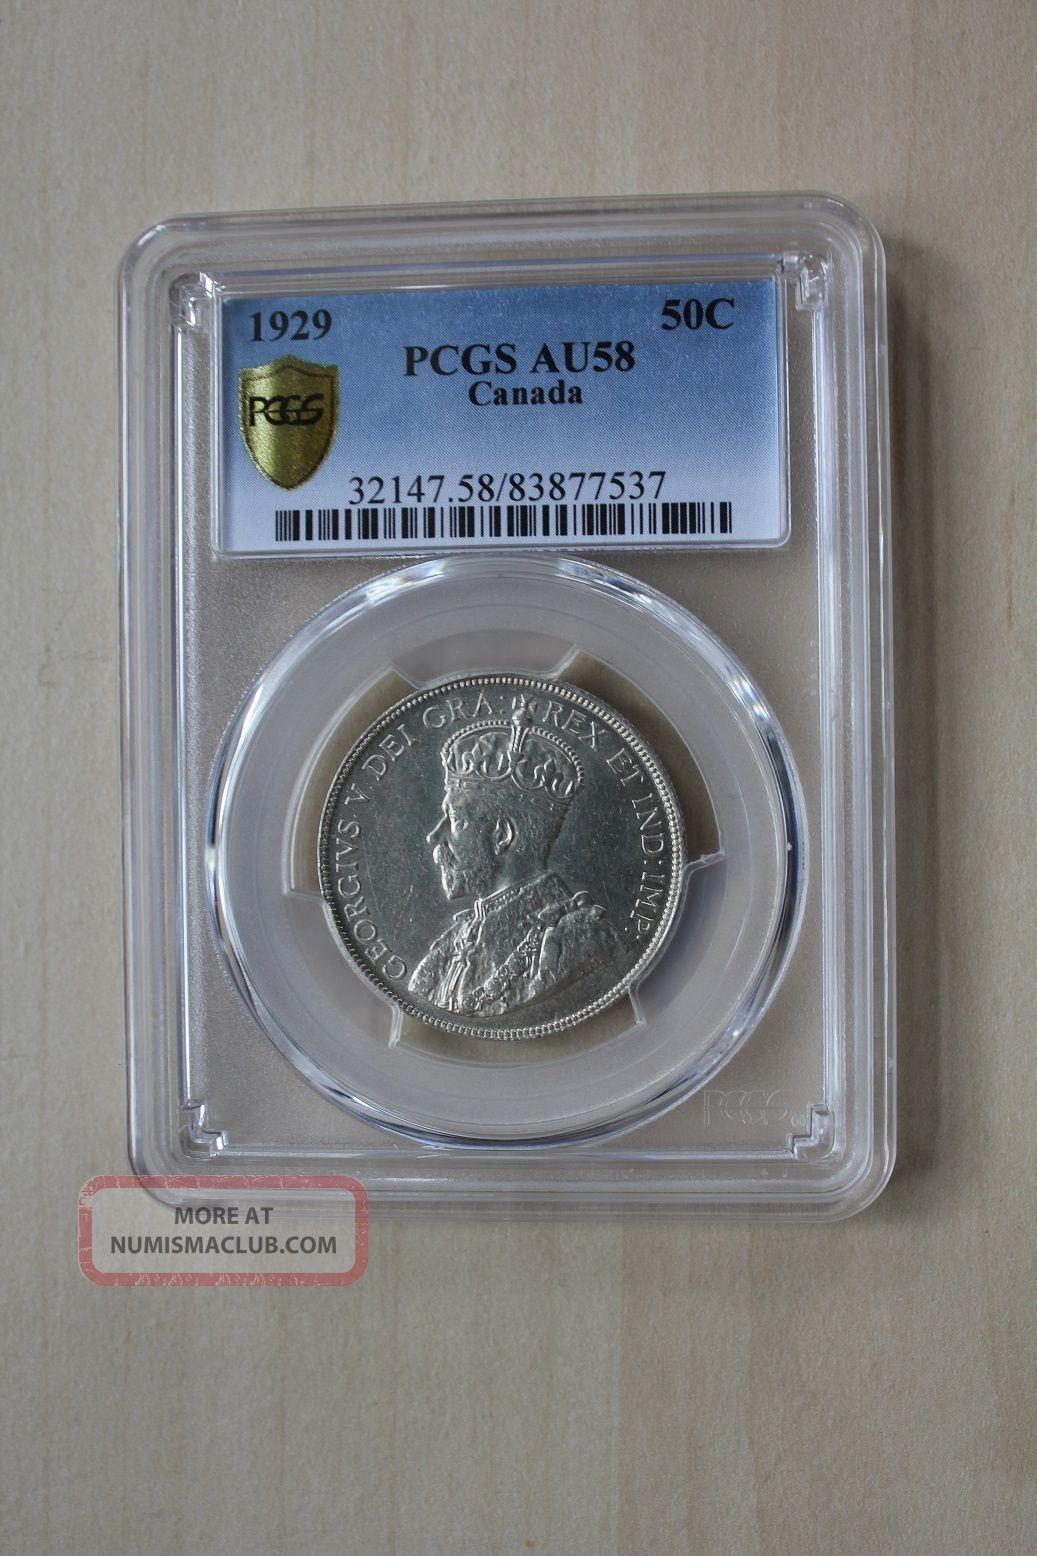 Canada 50 Cents 1929 Pcgs Grade Au 58 Nsw - Leipzig Coins: Canada photo